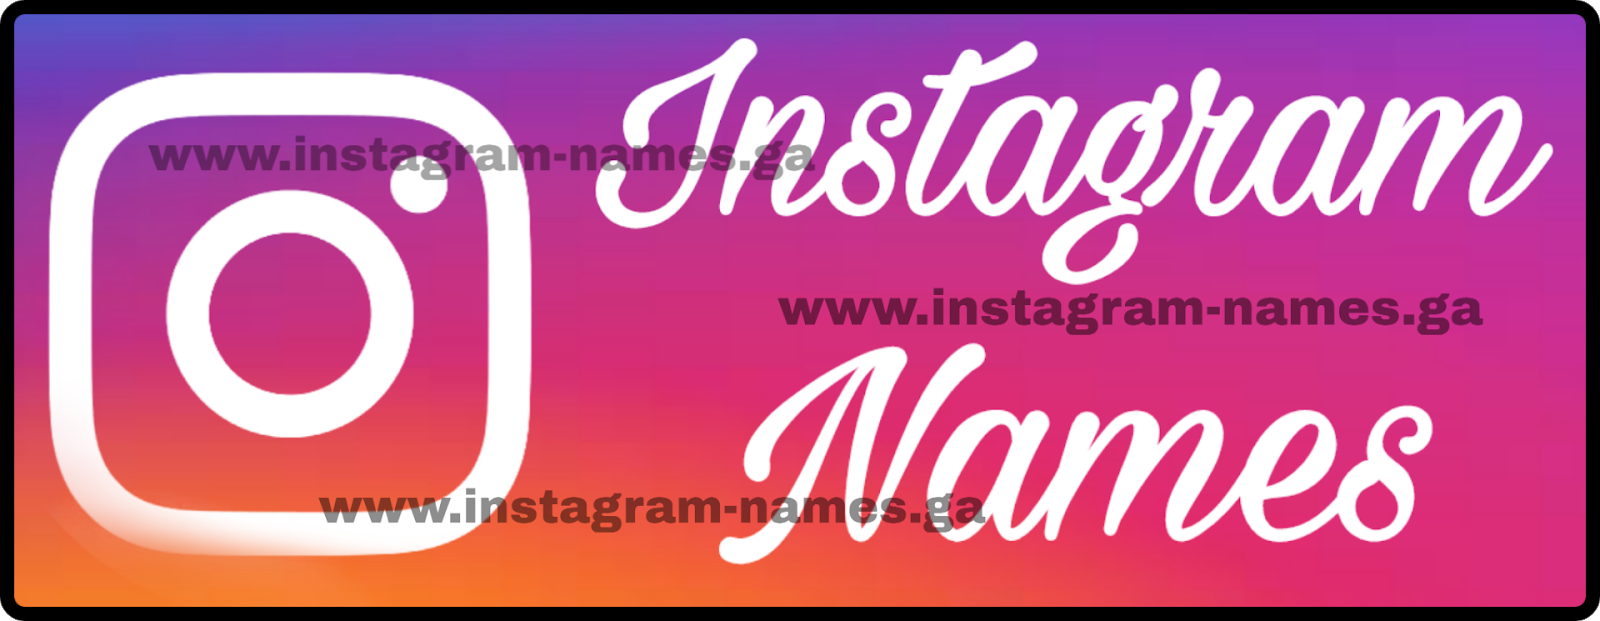 400+ BEST 2019 Instagram Names   Usernames for Boys and Girls